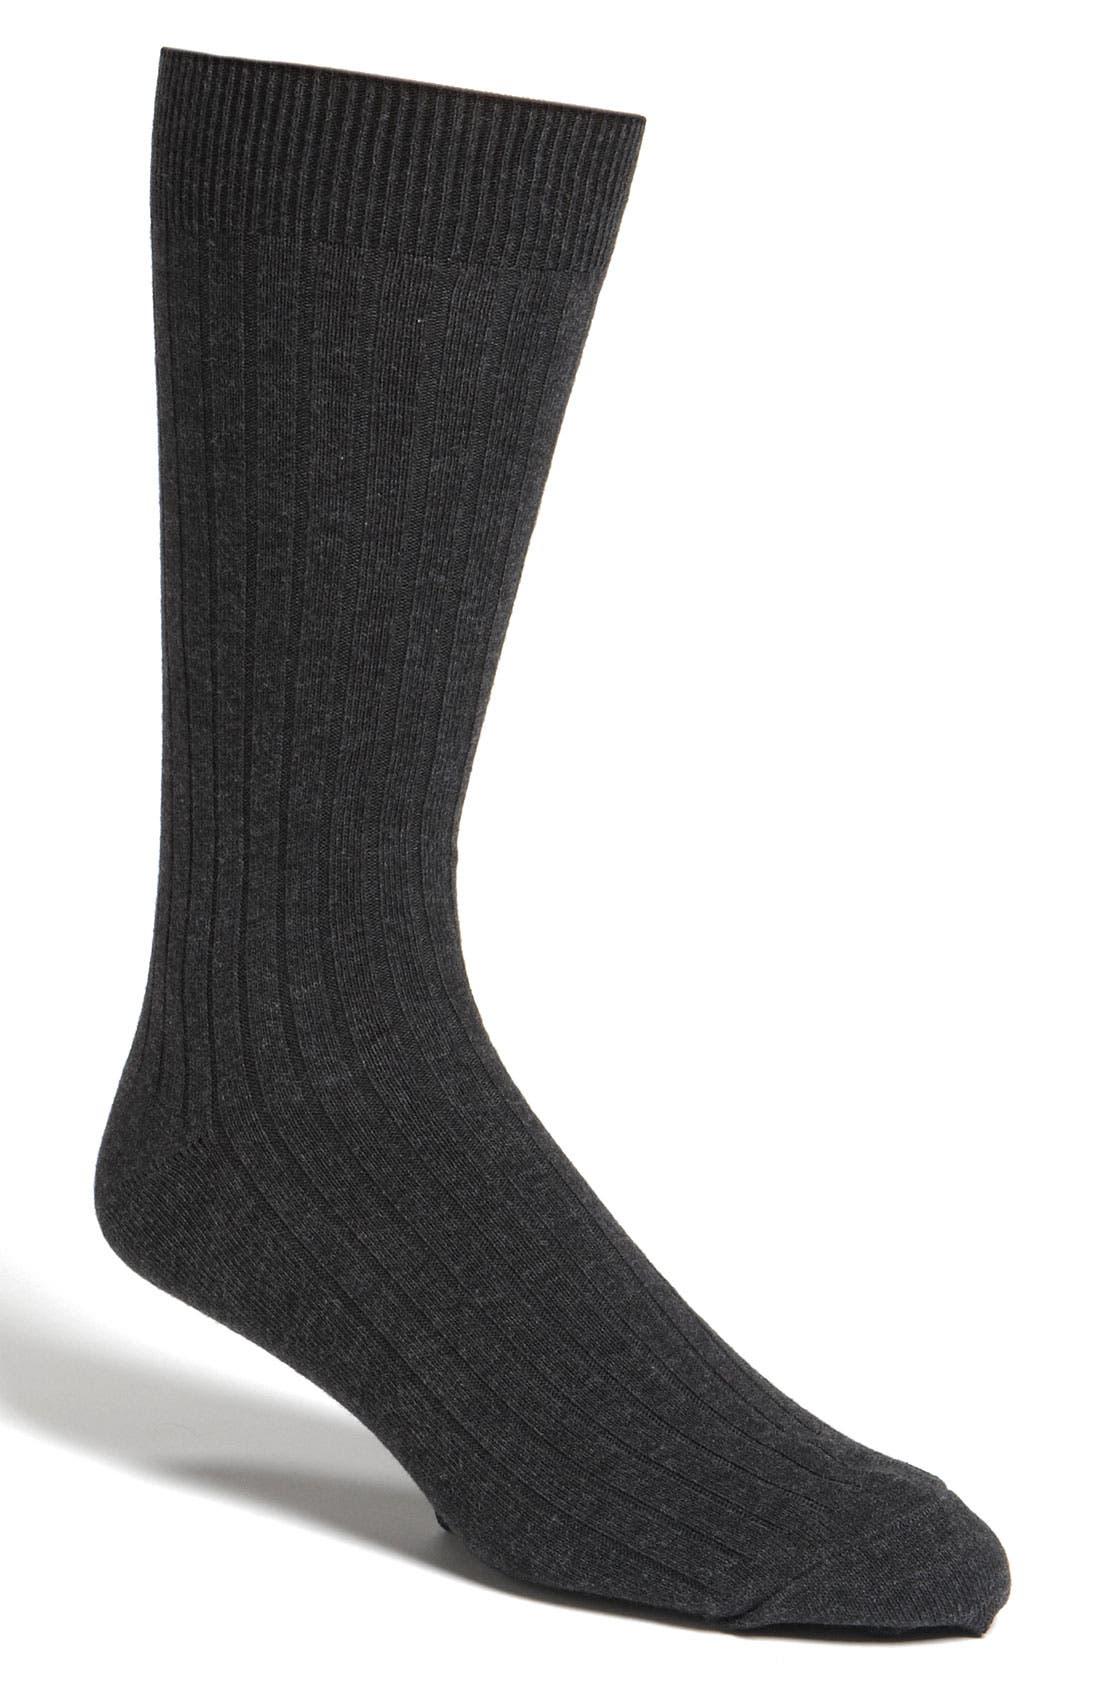 Cotton Blend Socks,                             Main thumbnail 1, color,                             002